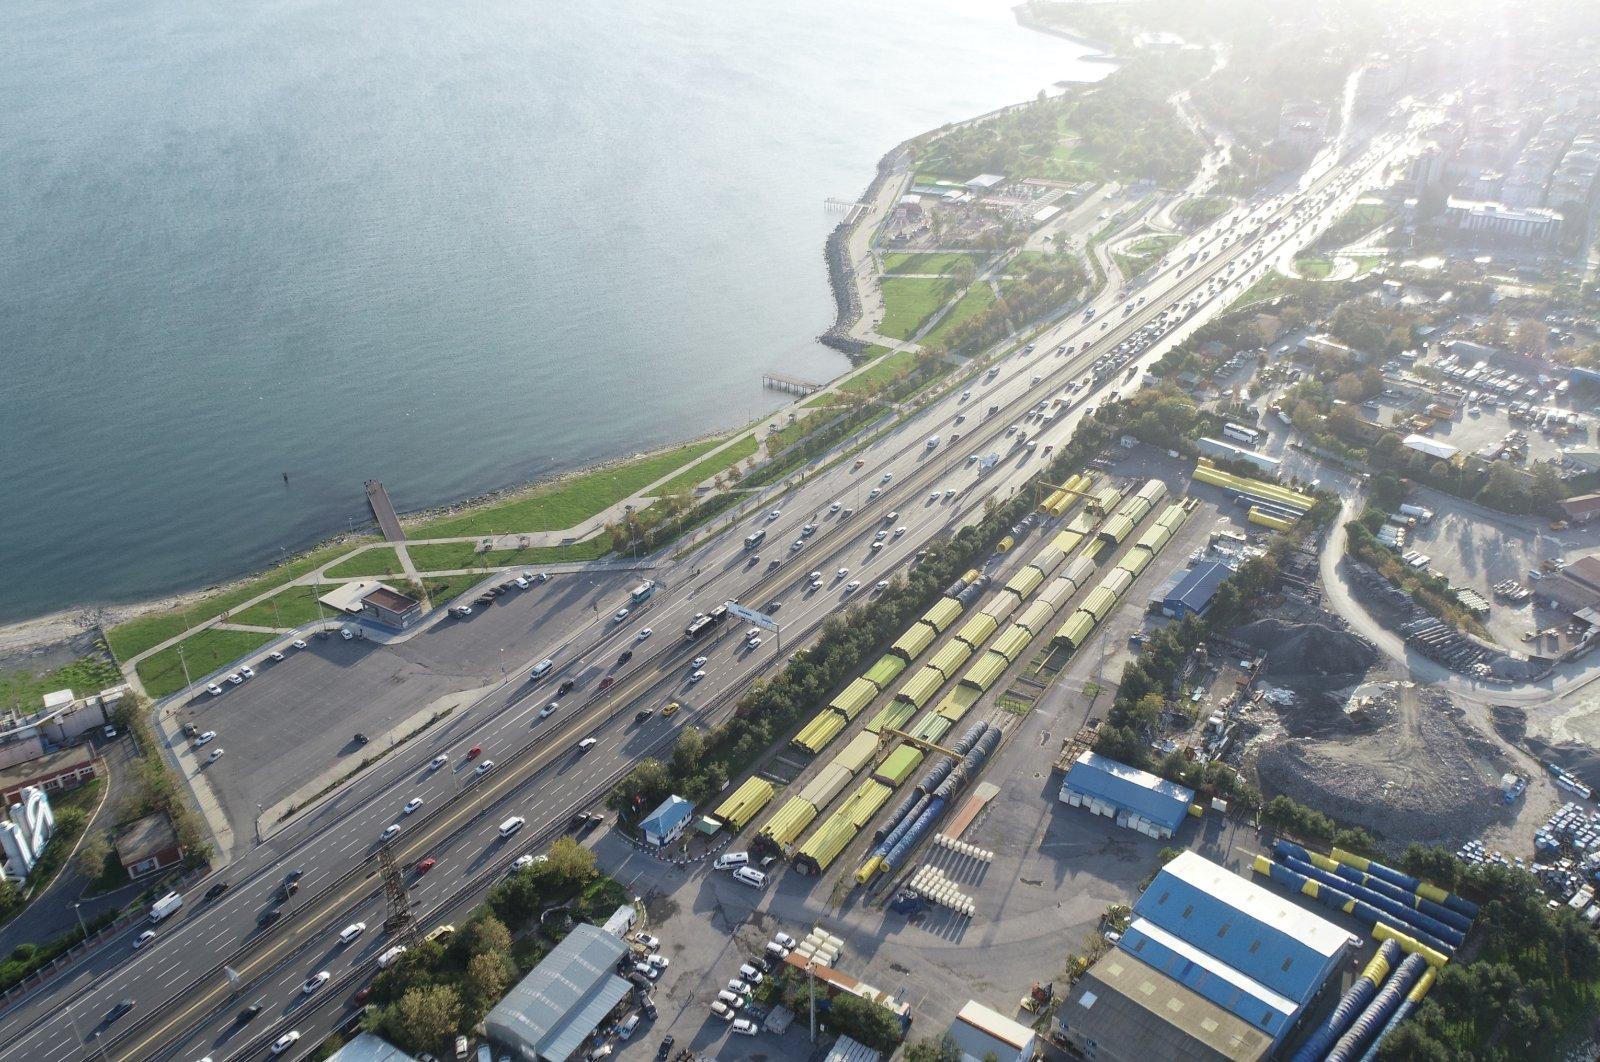 An aerial view of the coastal strip between Avcılar and Küçükçekmece districts, in Istanbul, Turkey, Nov. 11, 2020. (DHA Photo)